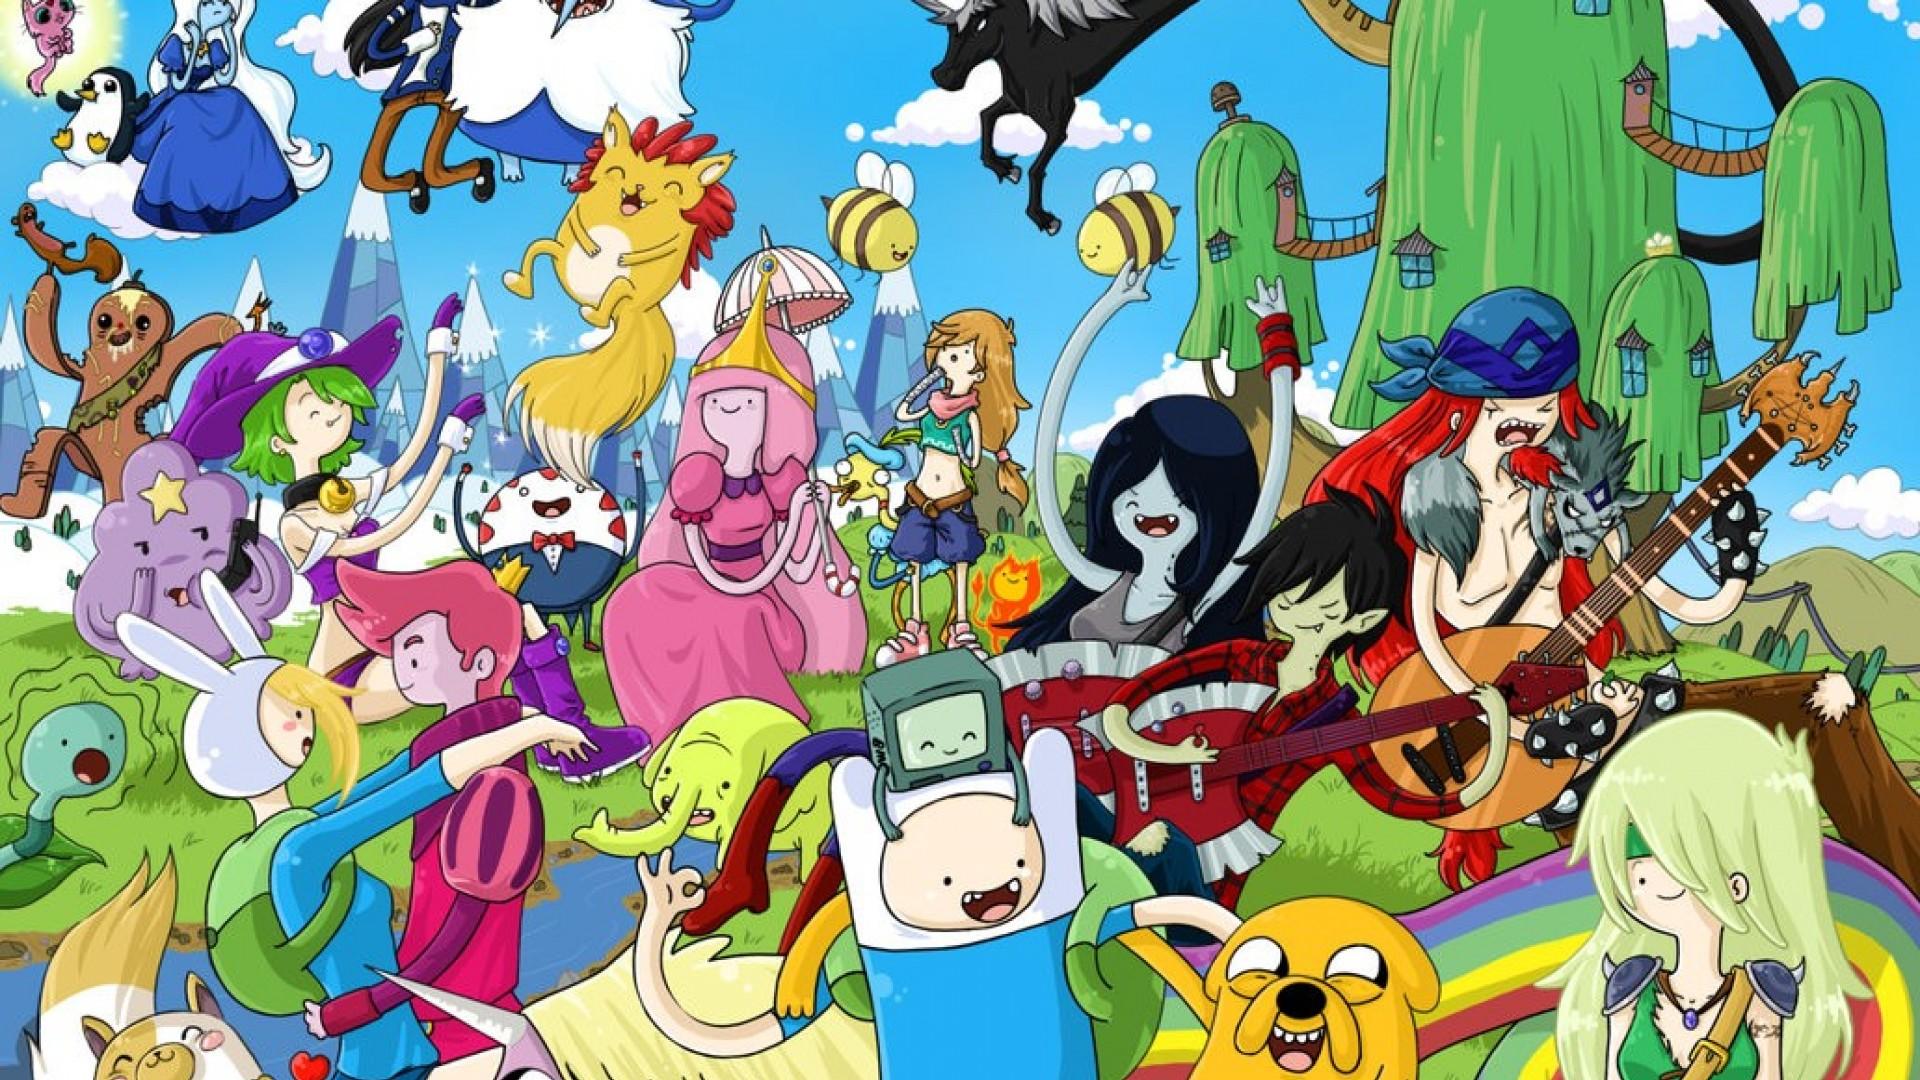 Adventure Time Wallpaper 1920x1080 1920x1080